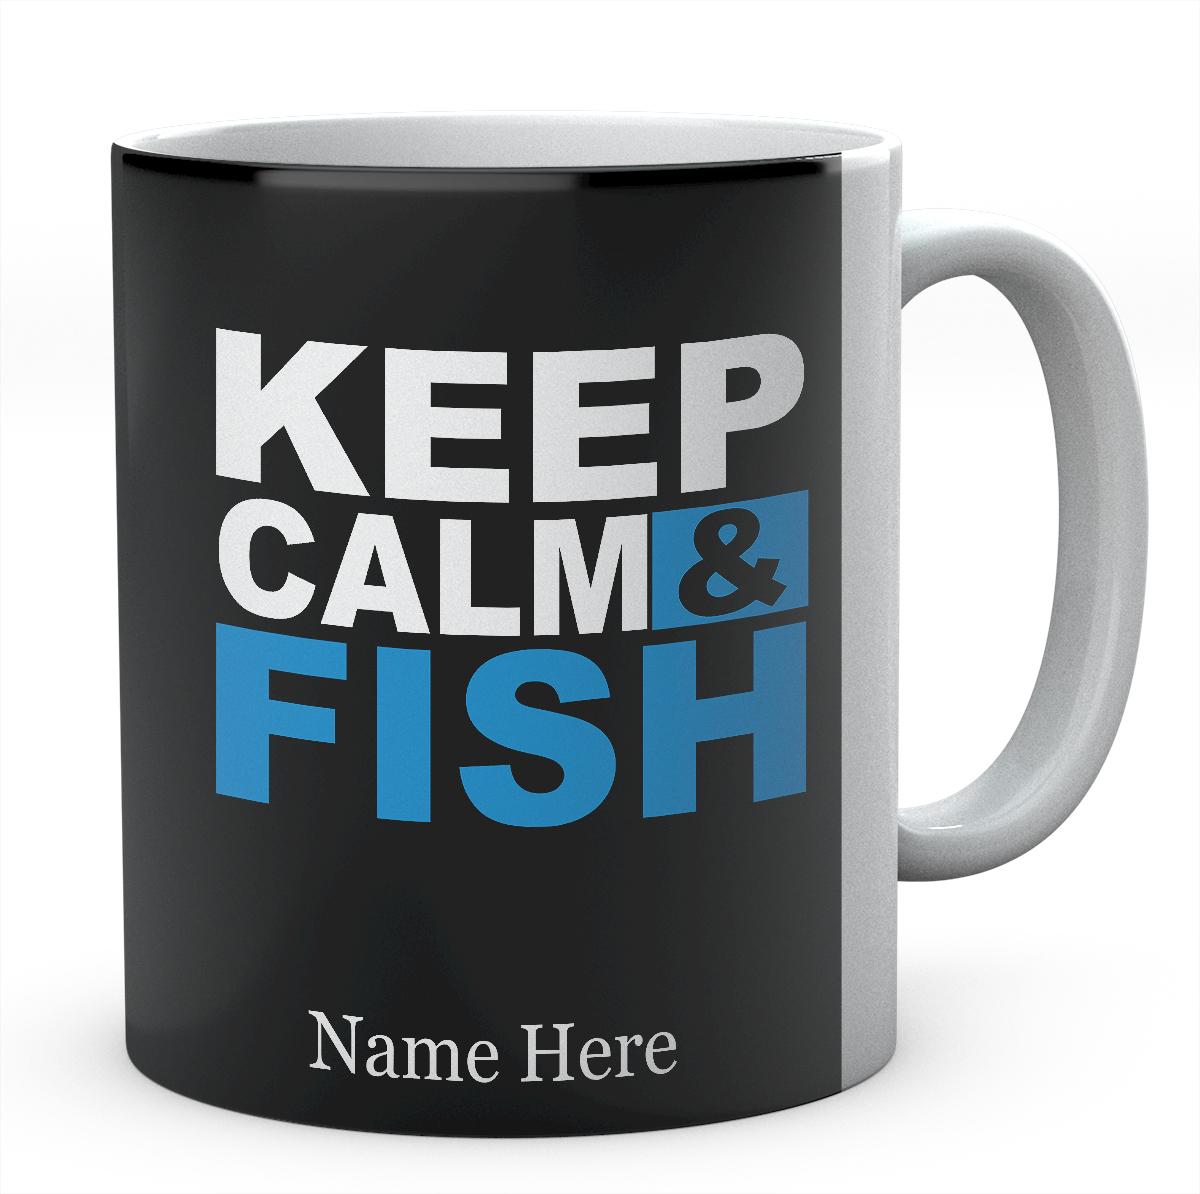 Personalised Keep Calm & Fish -Tea Coffee Mug